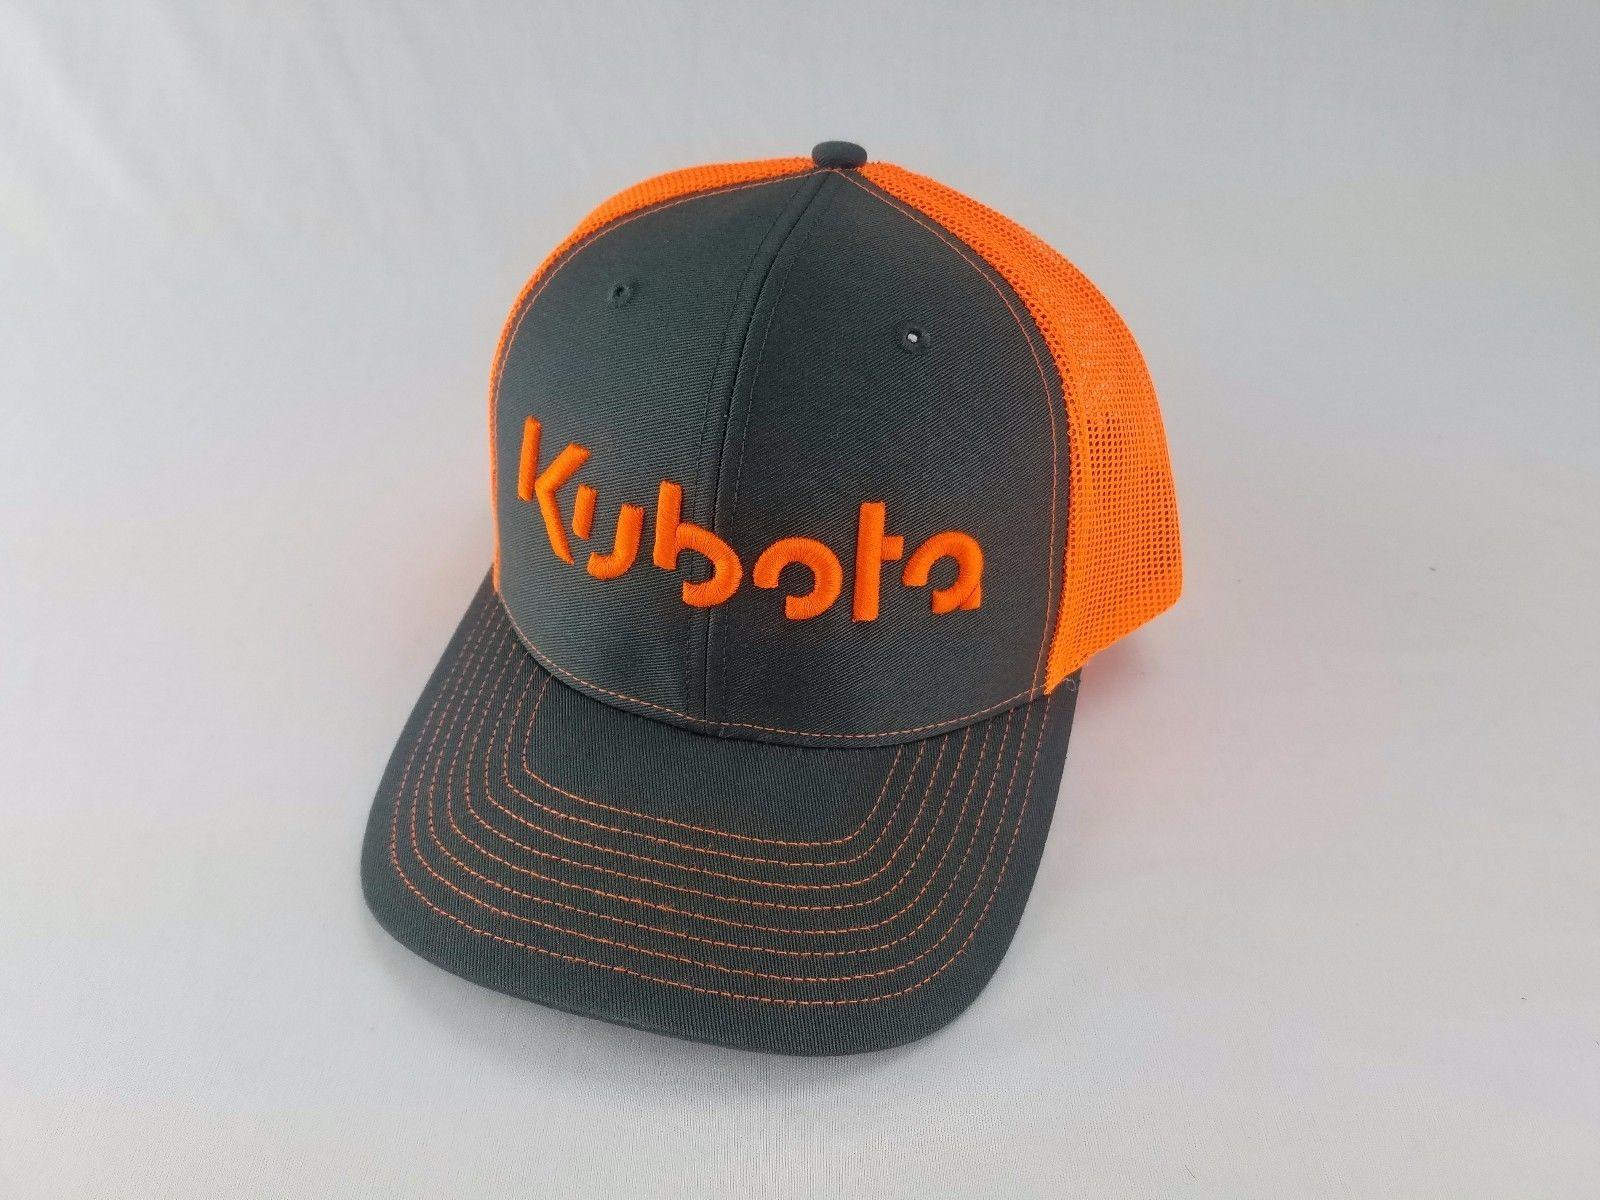 Kubota Trucker Hat, Kubota, Cap, Hat, and 50 similar items